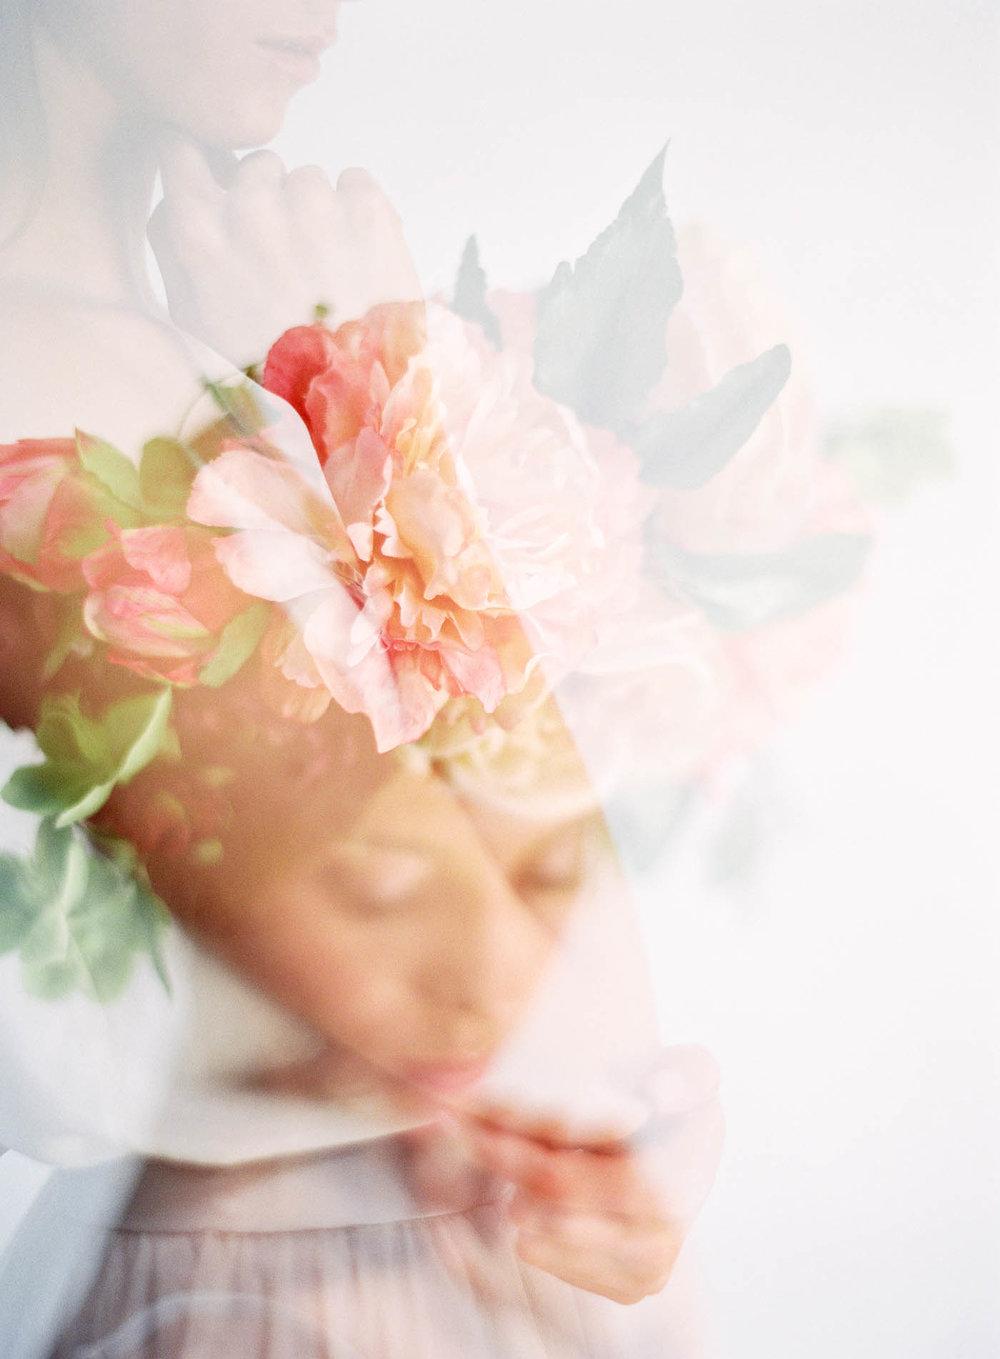 floral-crown-6-Jen_Huang-006844-R1-E006.jpg